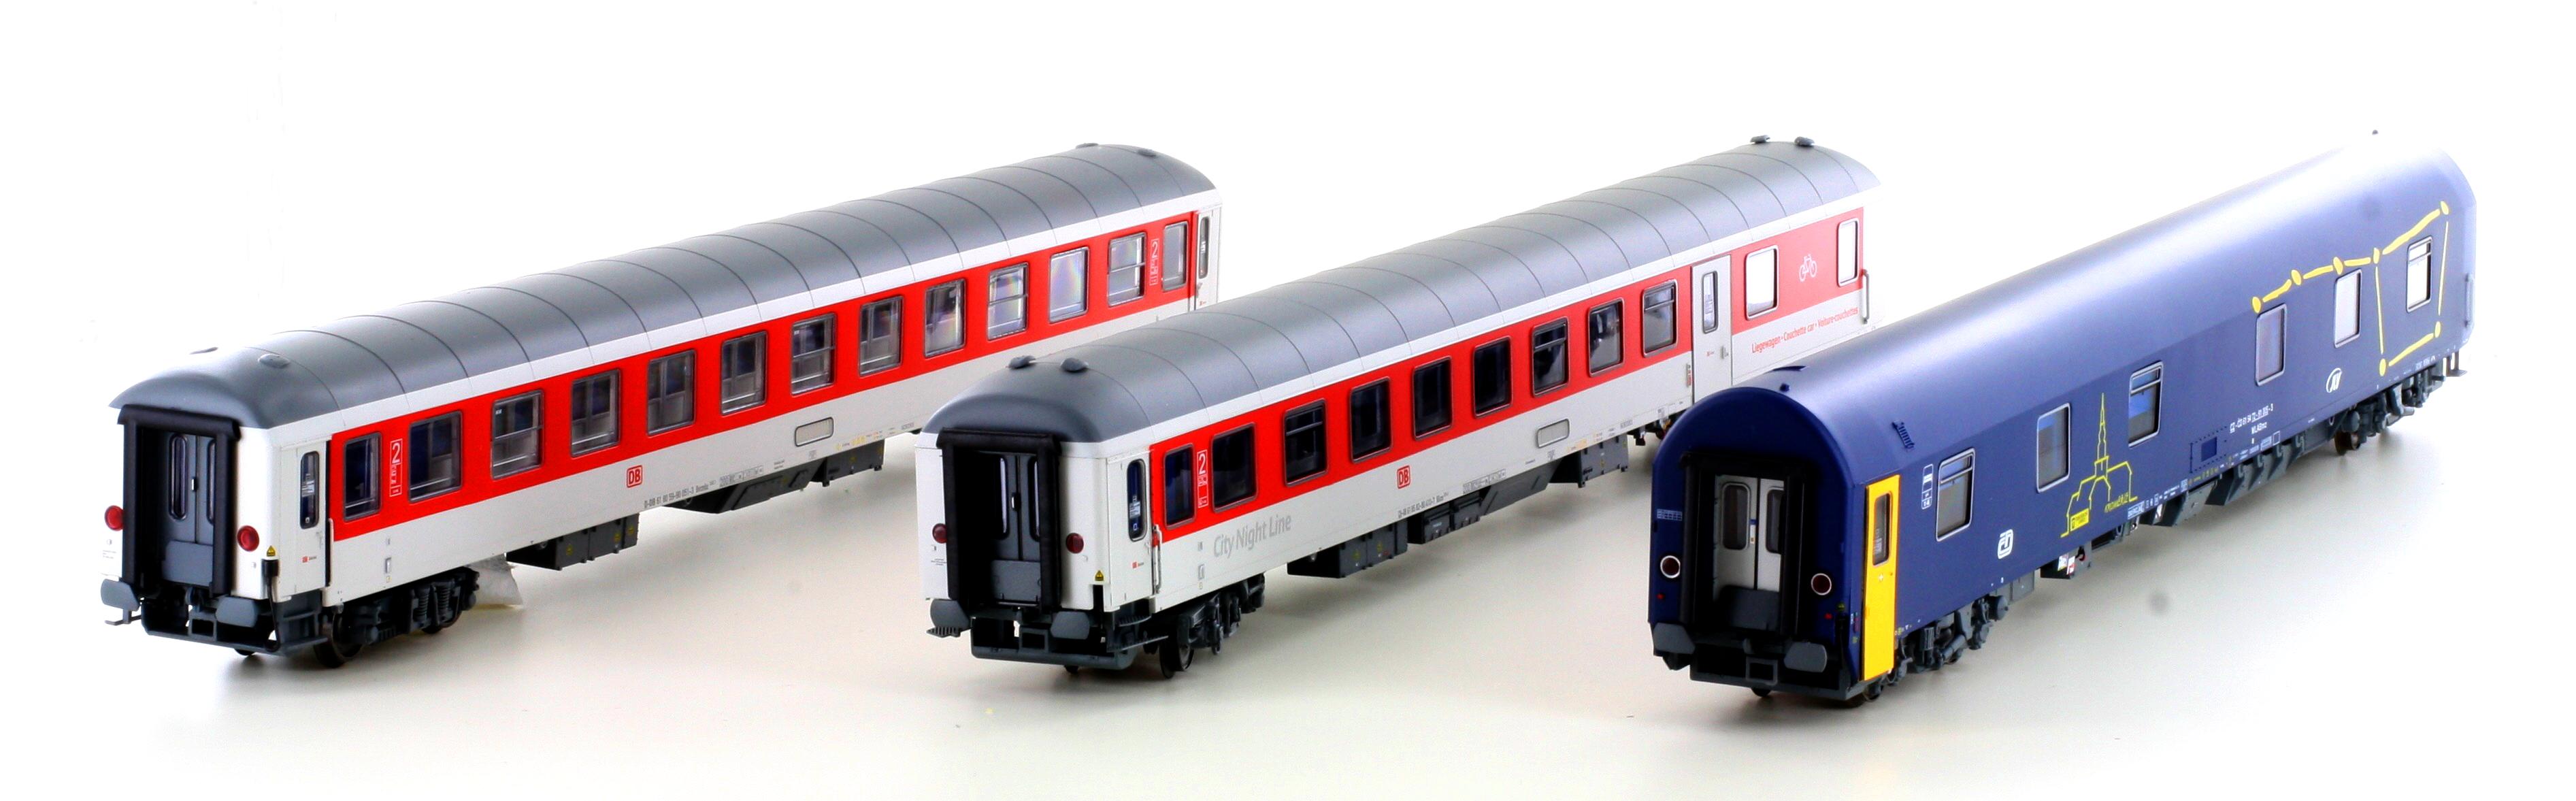 Ds Automodelle Modellbauvertrieb Ls Models 187 3tlg Set Cnl Ep